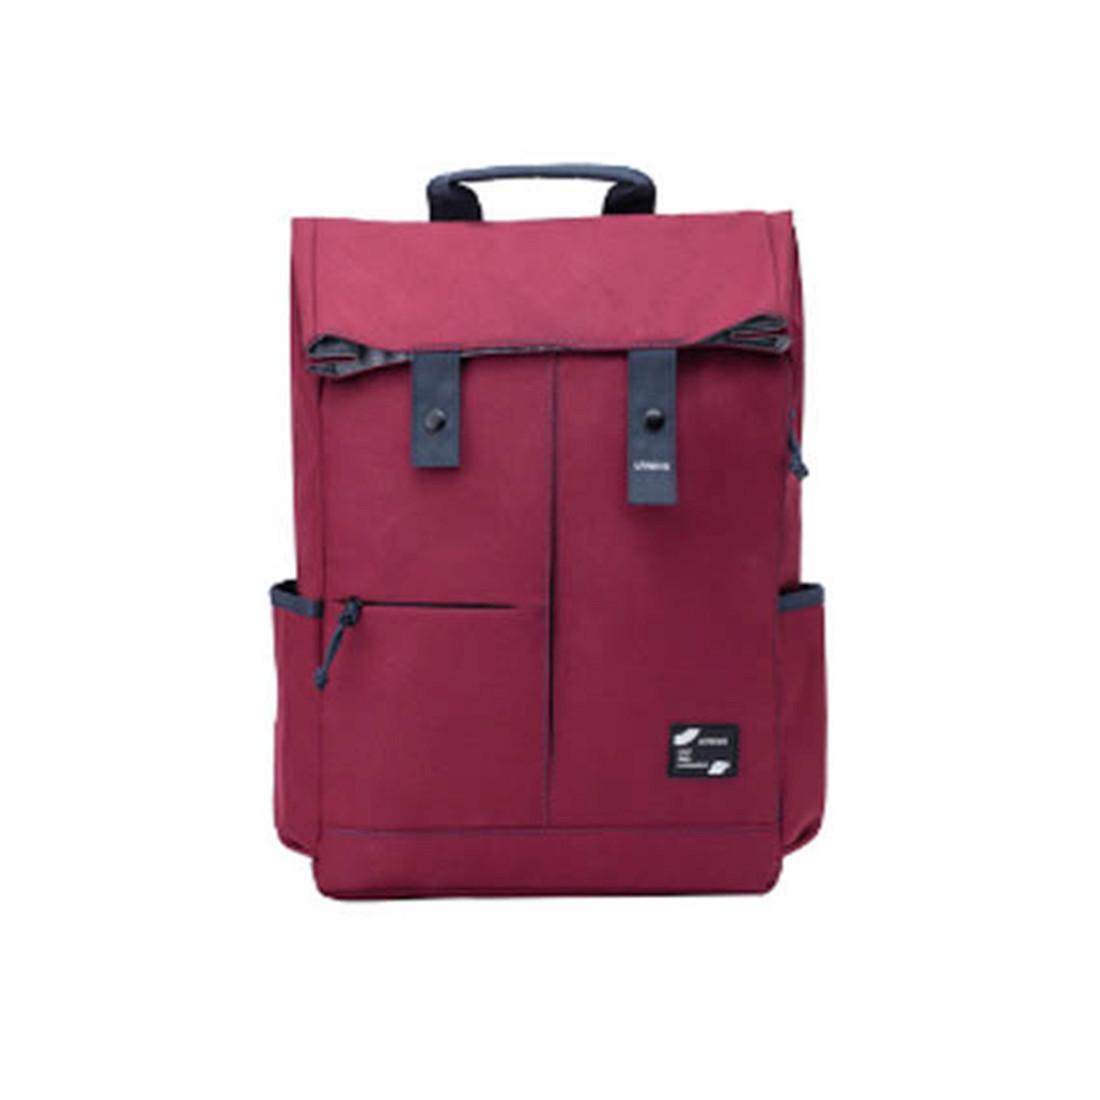 Рюкзак Xiaomi Urevo YouQi Energy College Leisure Backpack Bordo